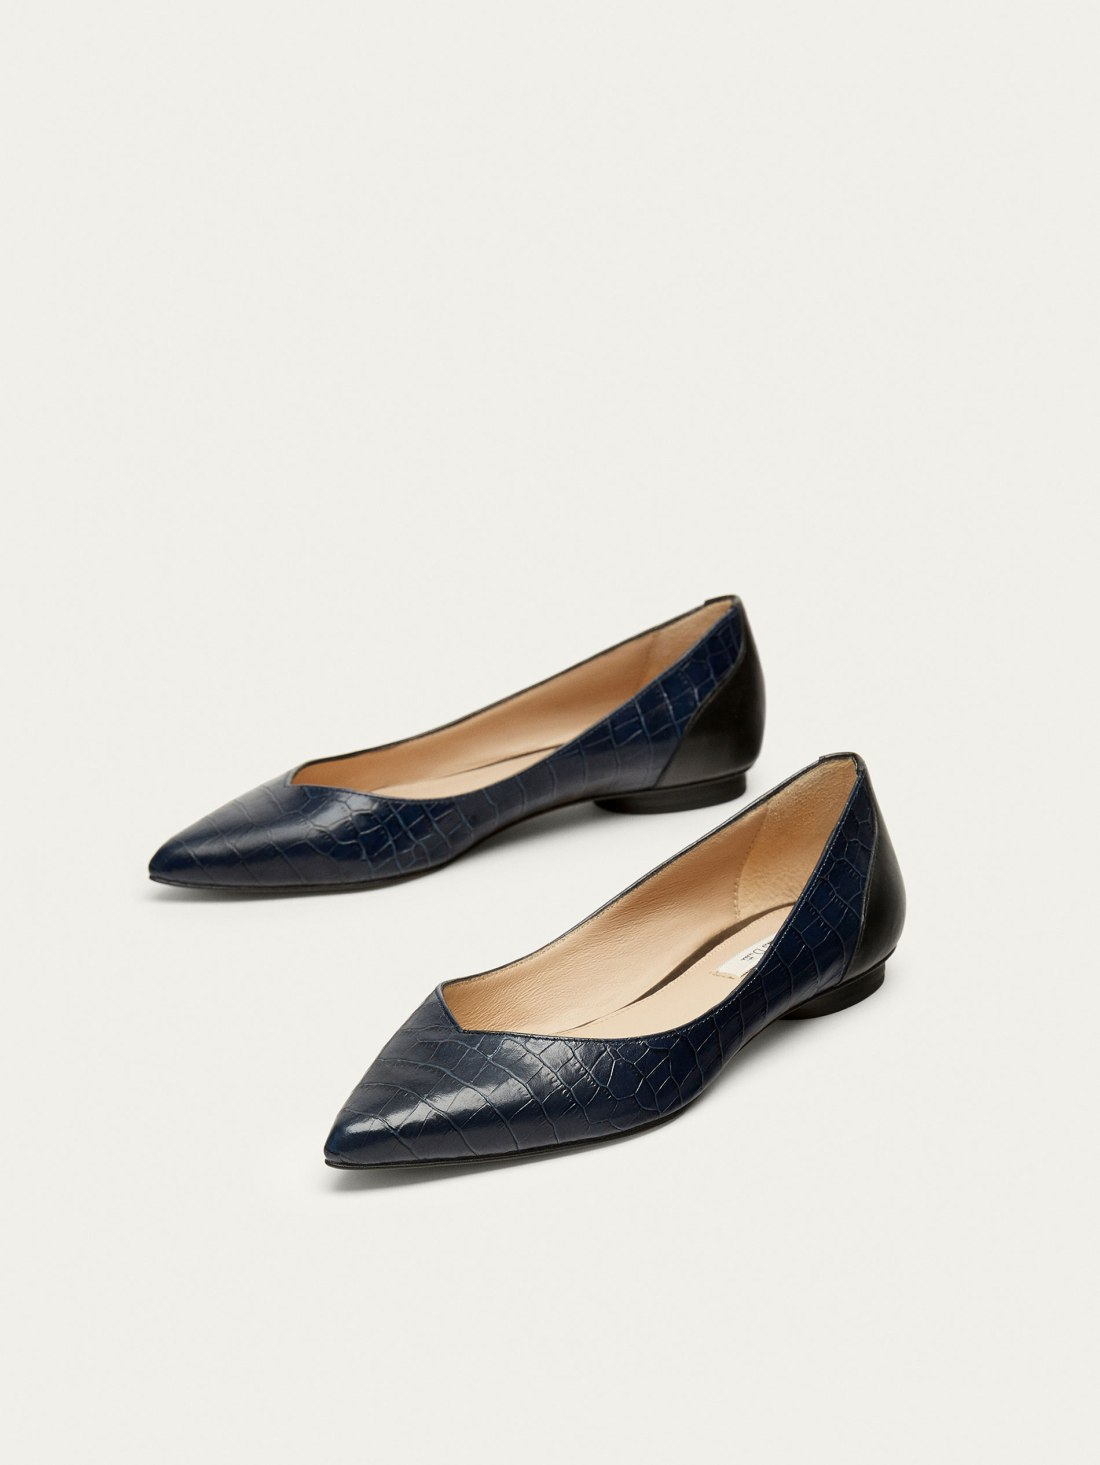 Massimo Dutti work shoes